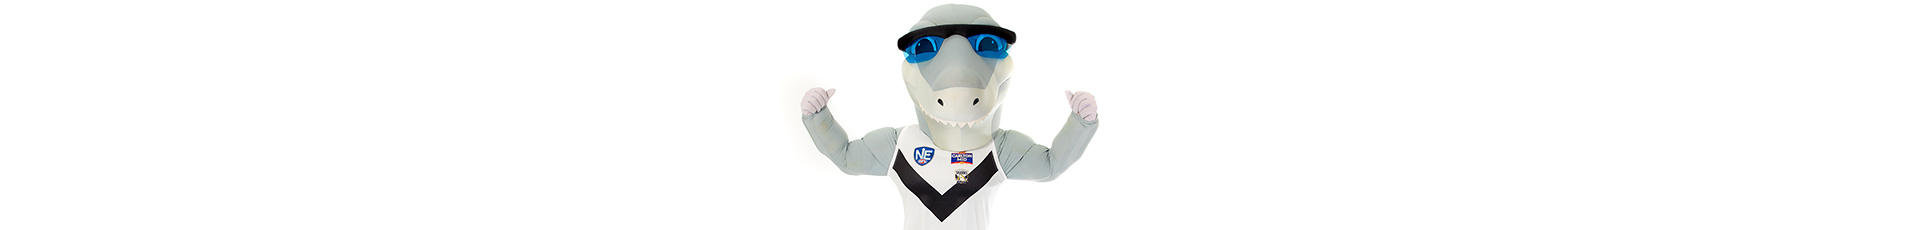 Southport Sharks mascot Mr Sharky